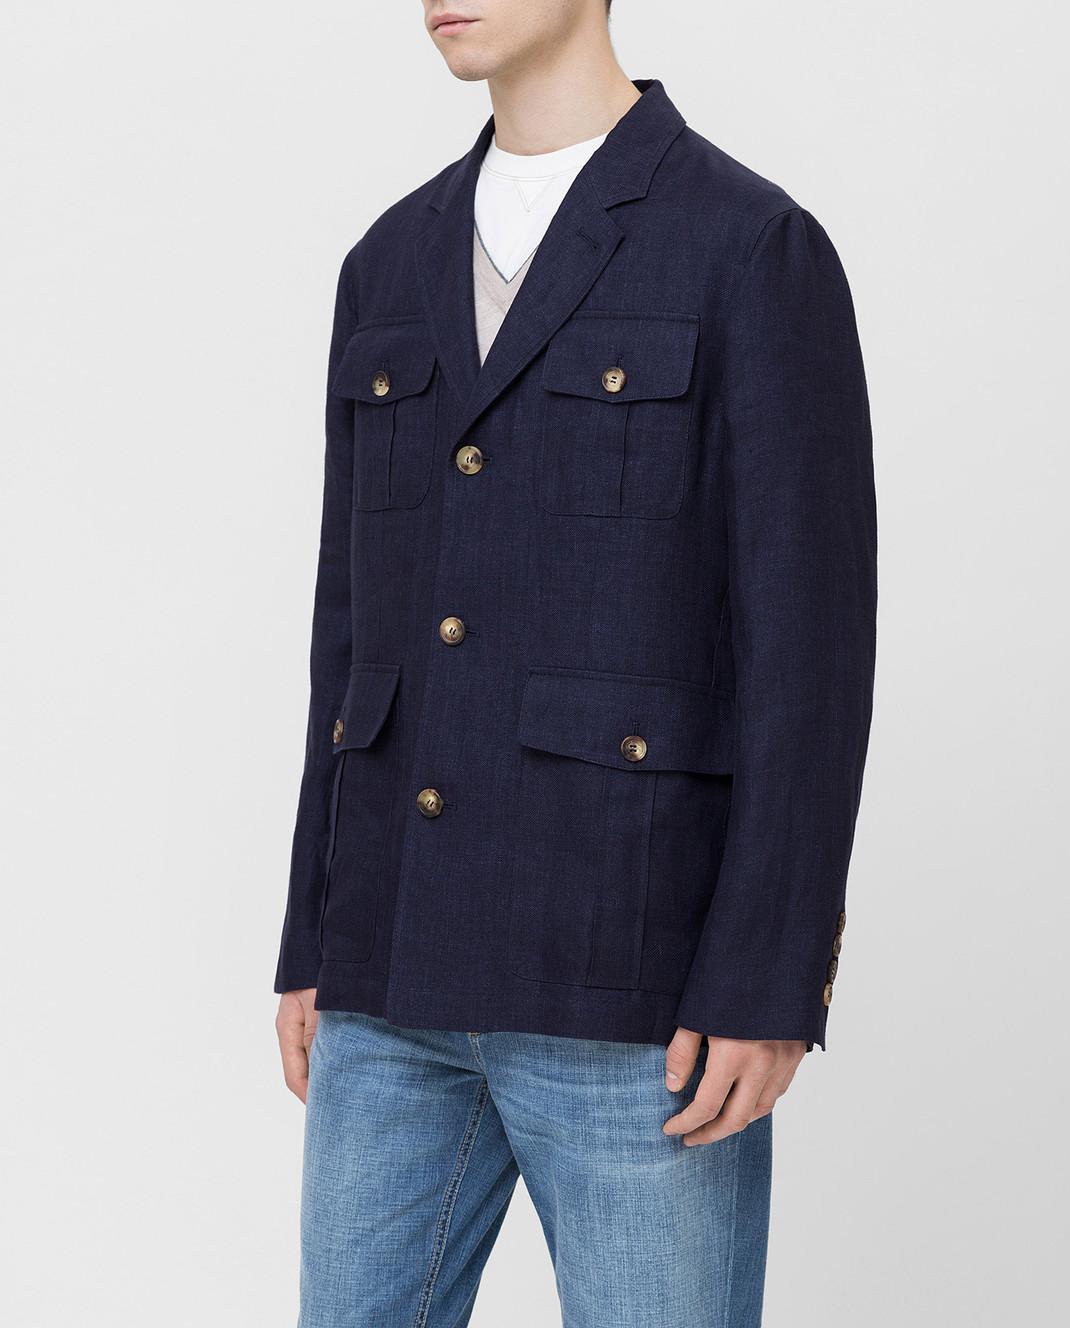 Brunello Cucinelli Синяя куртка MD4176848 изображение 3